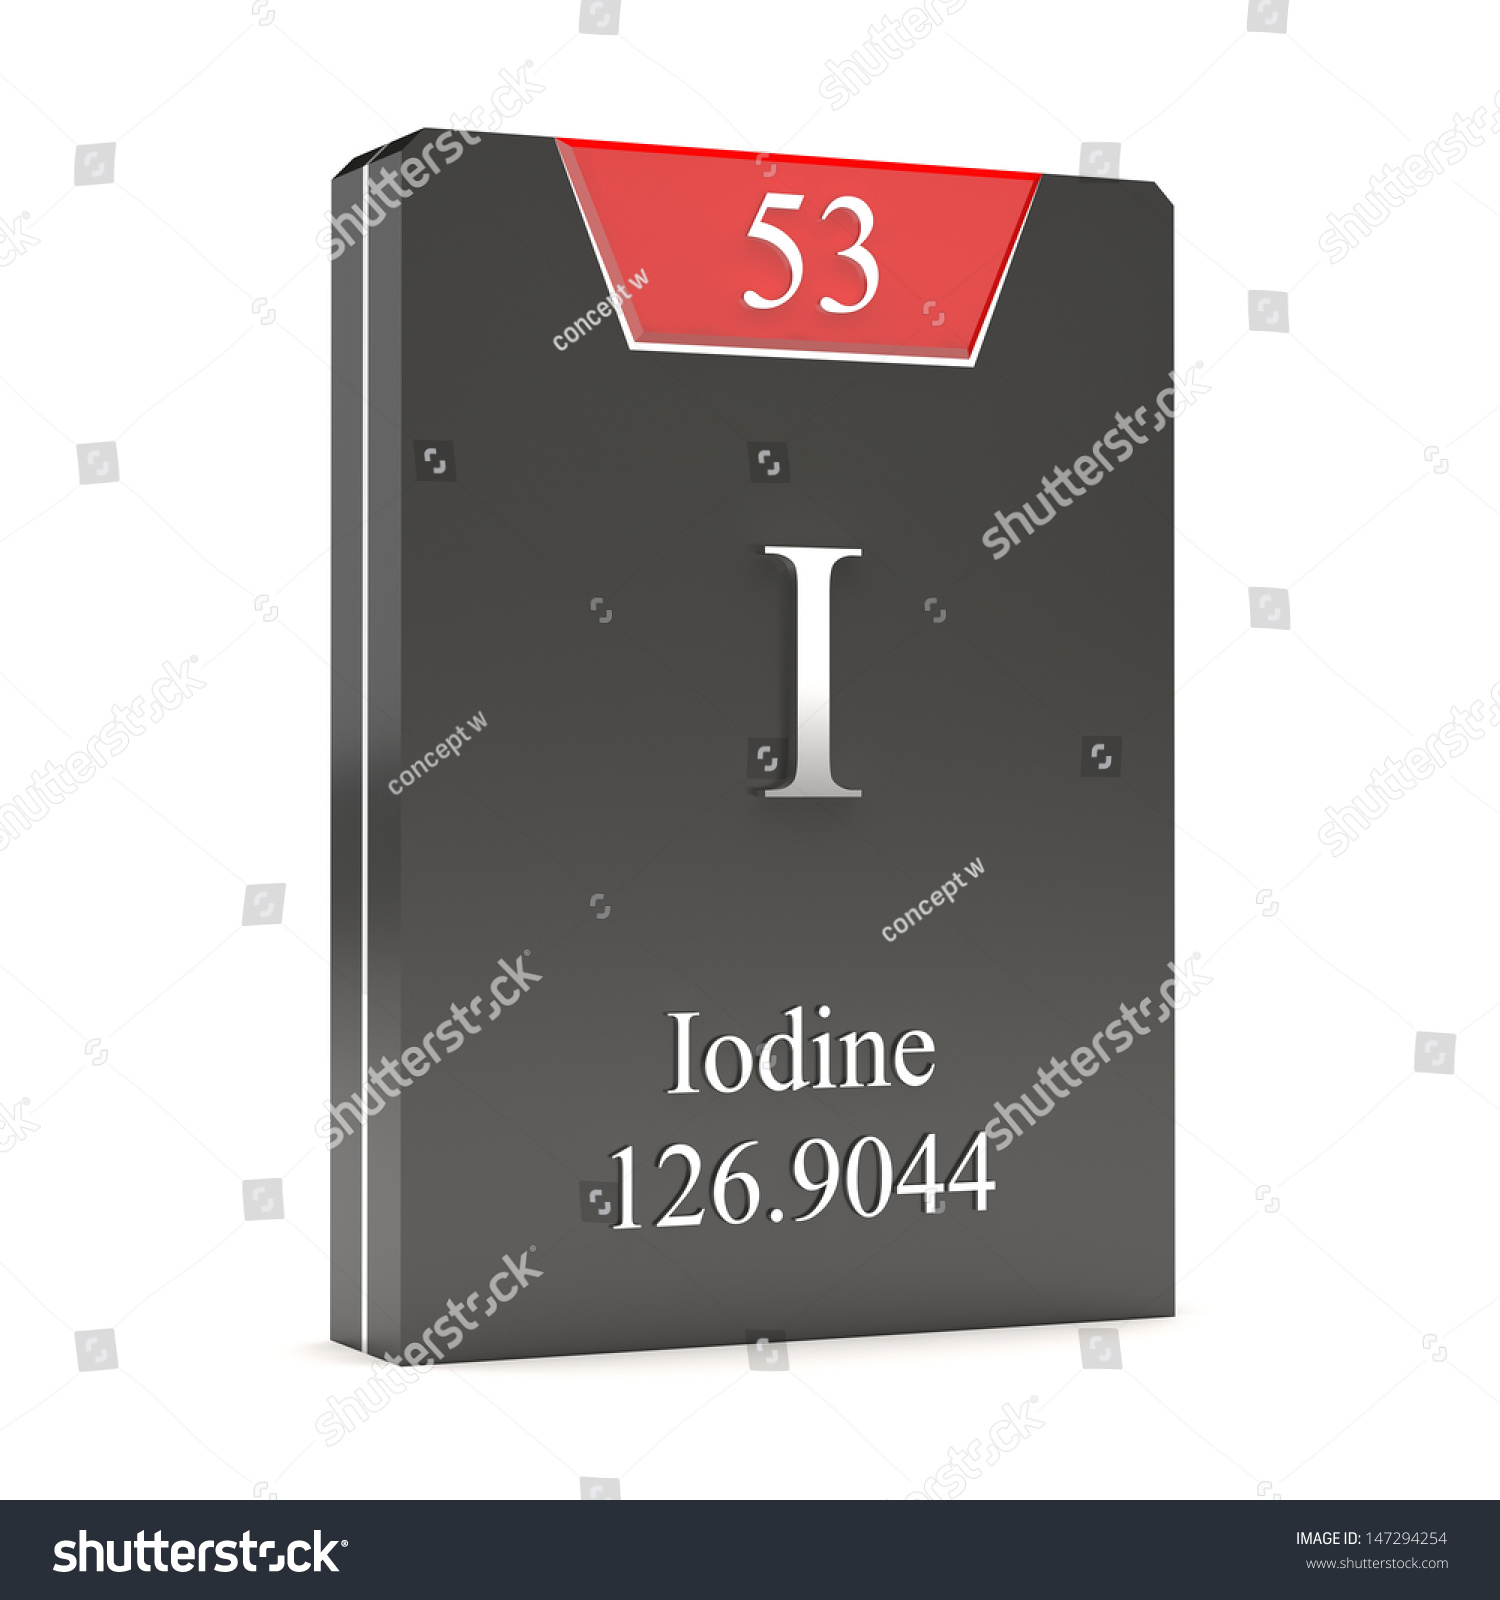 Iodine i 53 periodic table stock illustration 147294254 shutterstock iodine i 53 from periodic table gamestrikefo Gallery